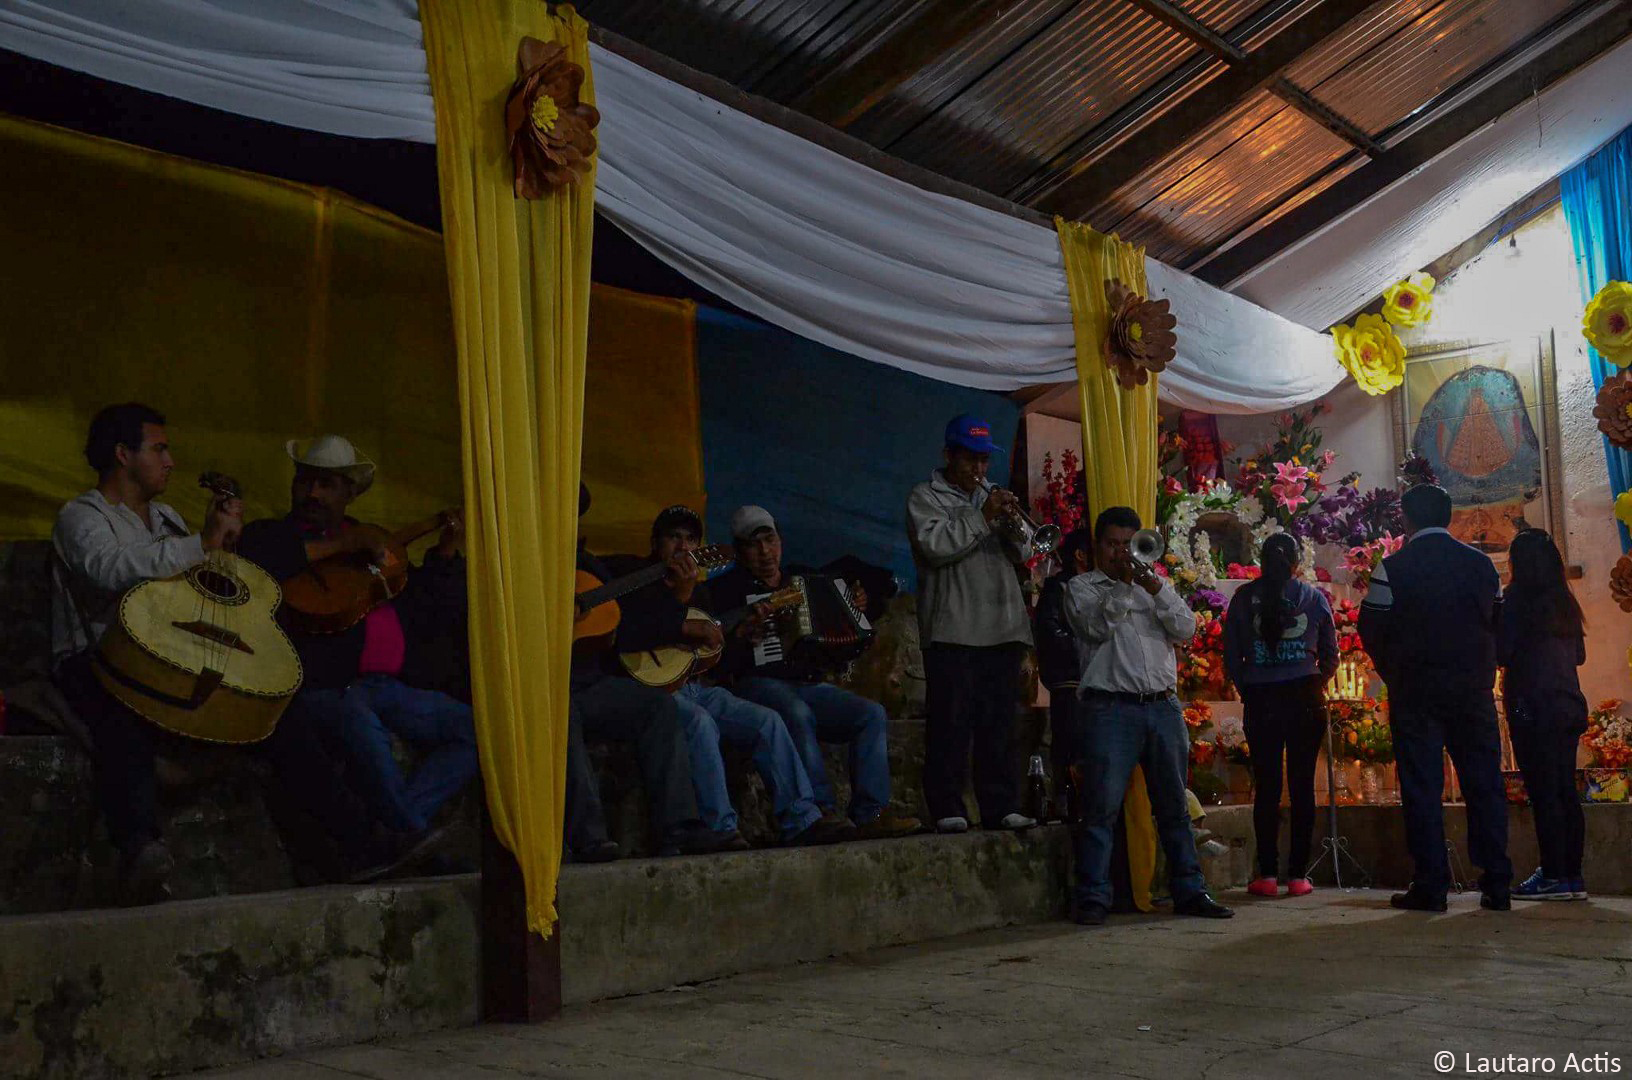 Fiesta de la Virgen de Guadalupe ©